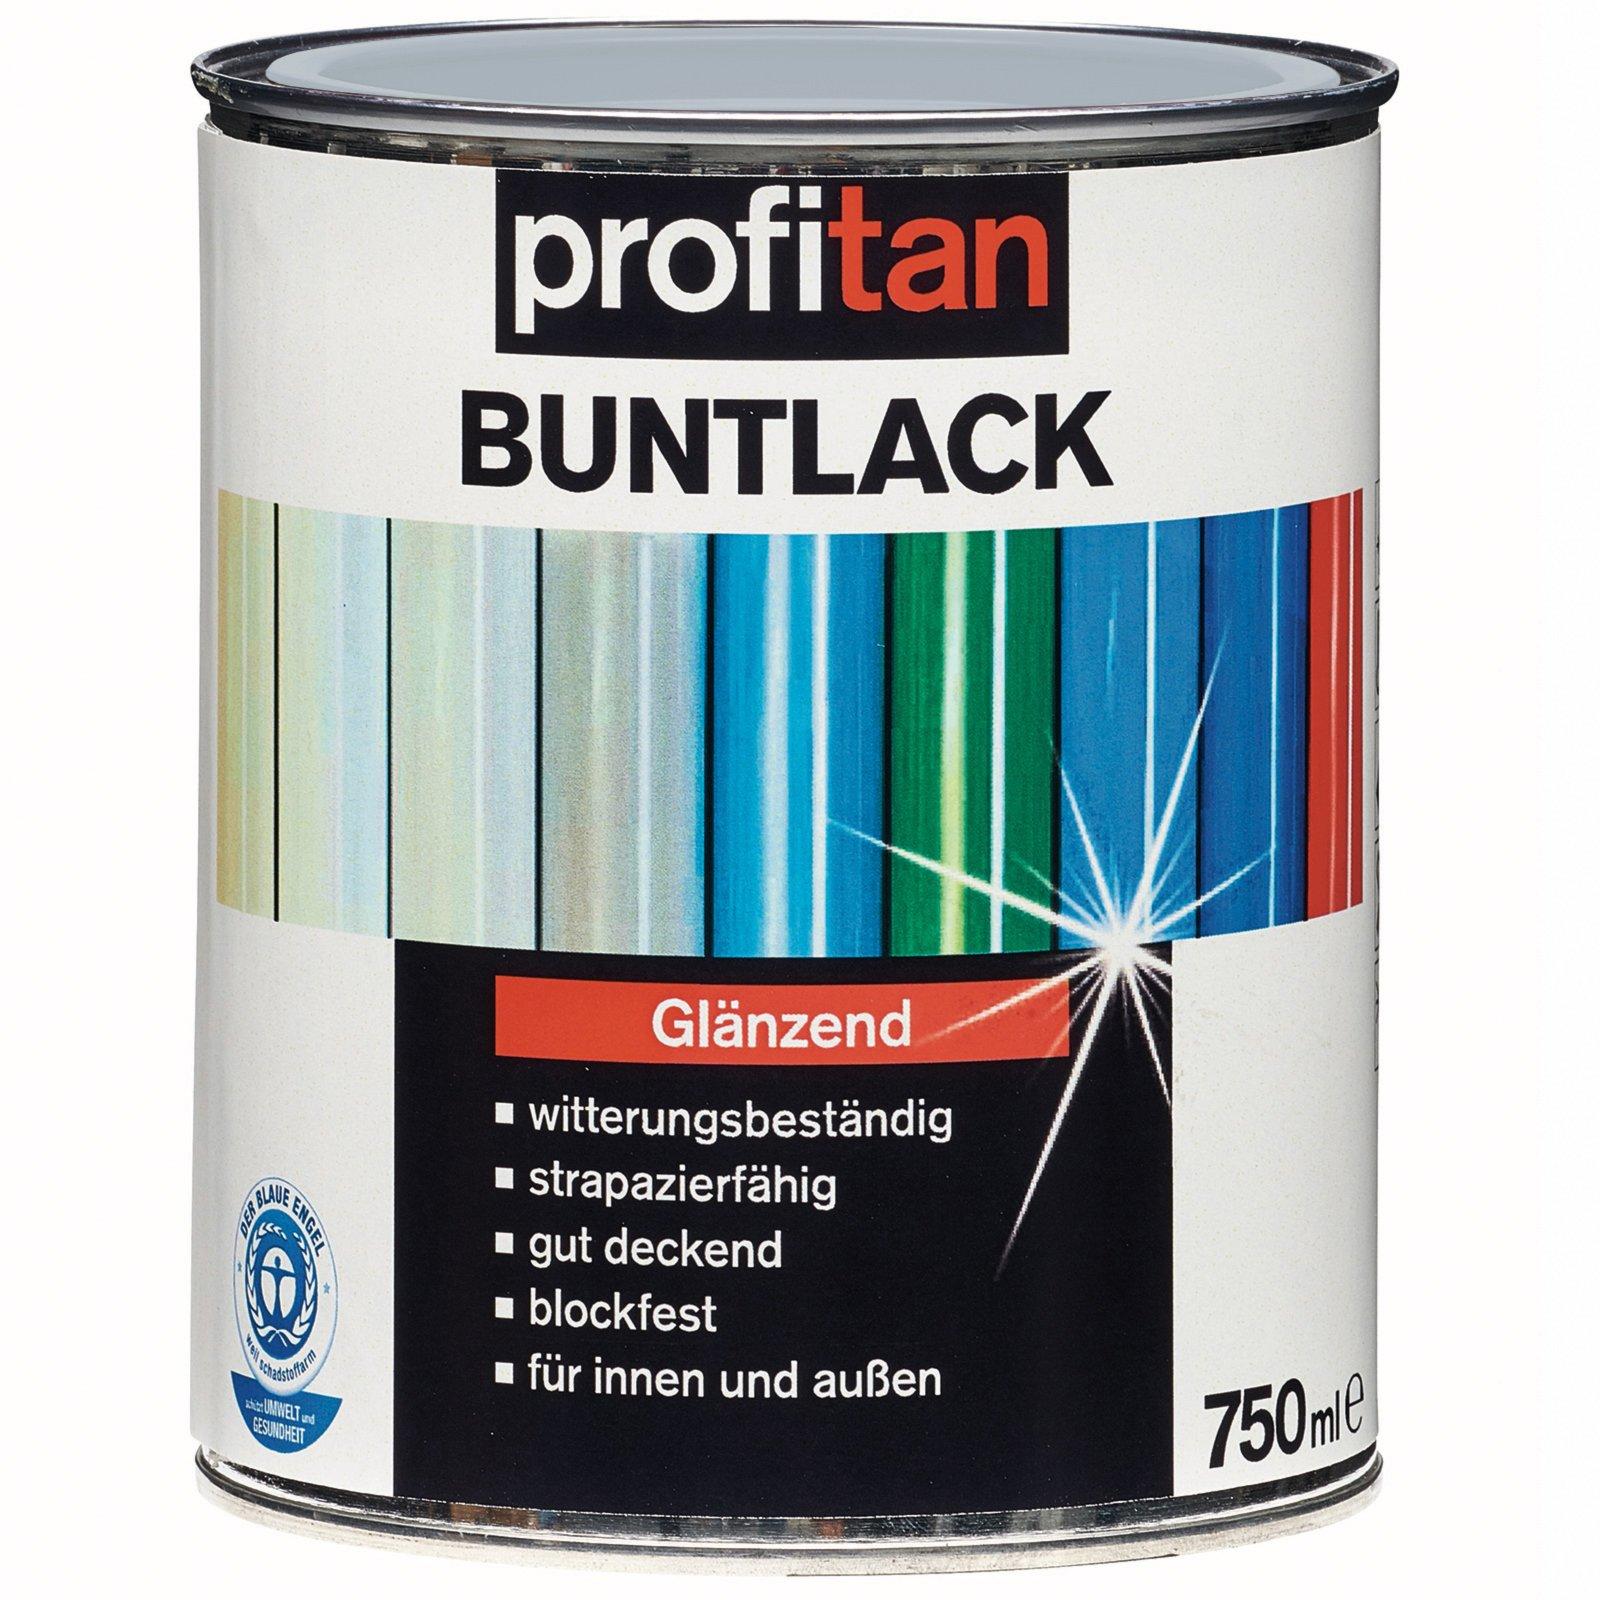 profitan Buntlack - lichtgrau glänzend - 750 ml